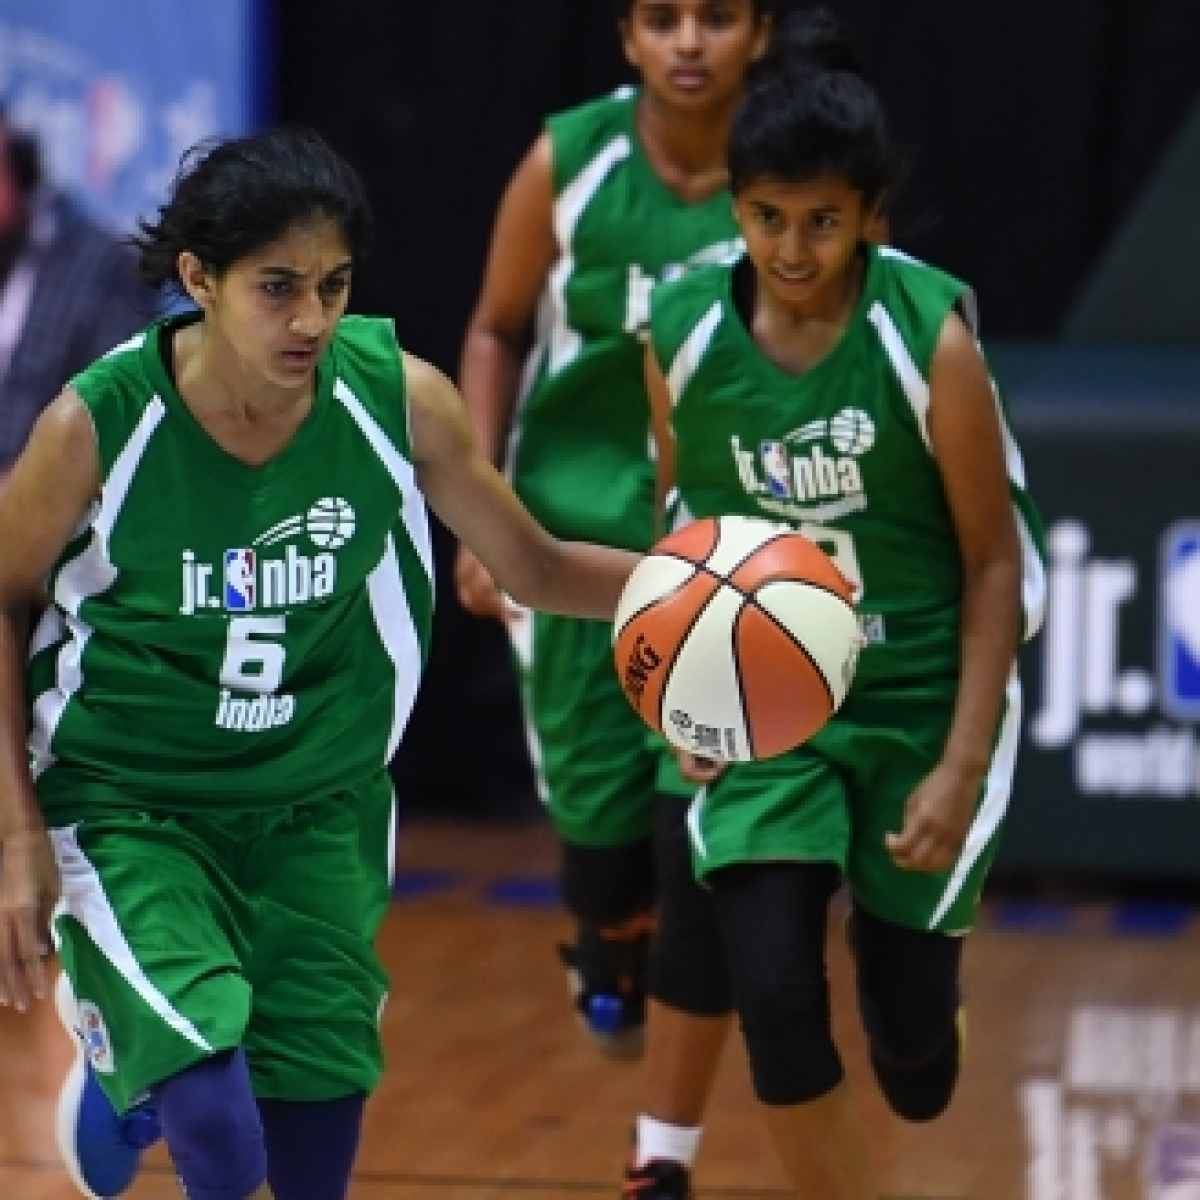 Watch: India's Jr. NBA Global Championship girls show off their 'ball' skills amid coronavirus crisis